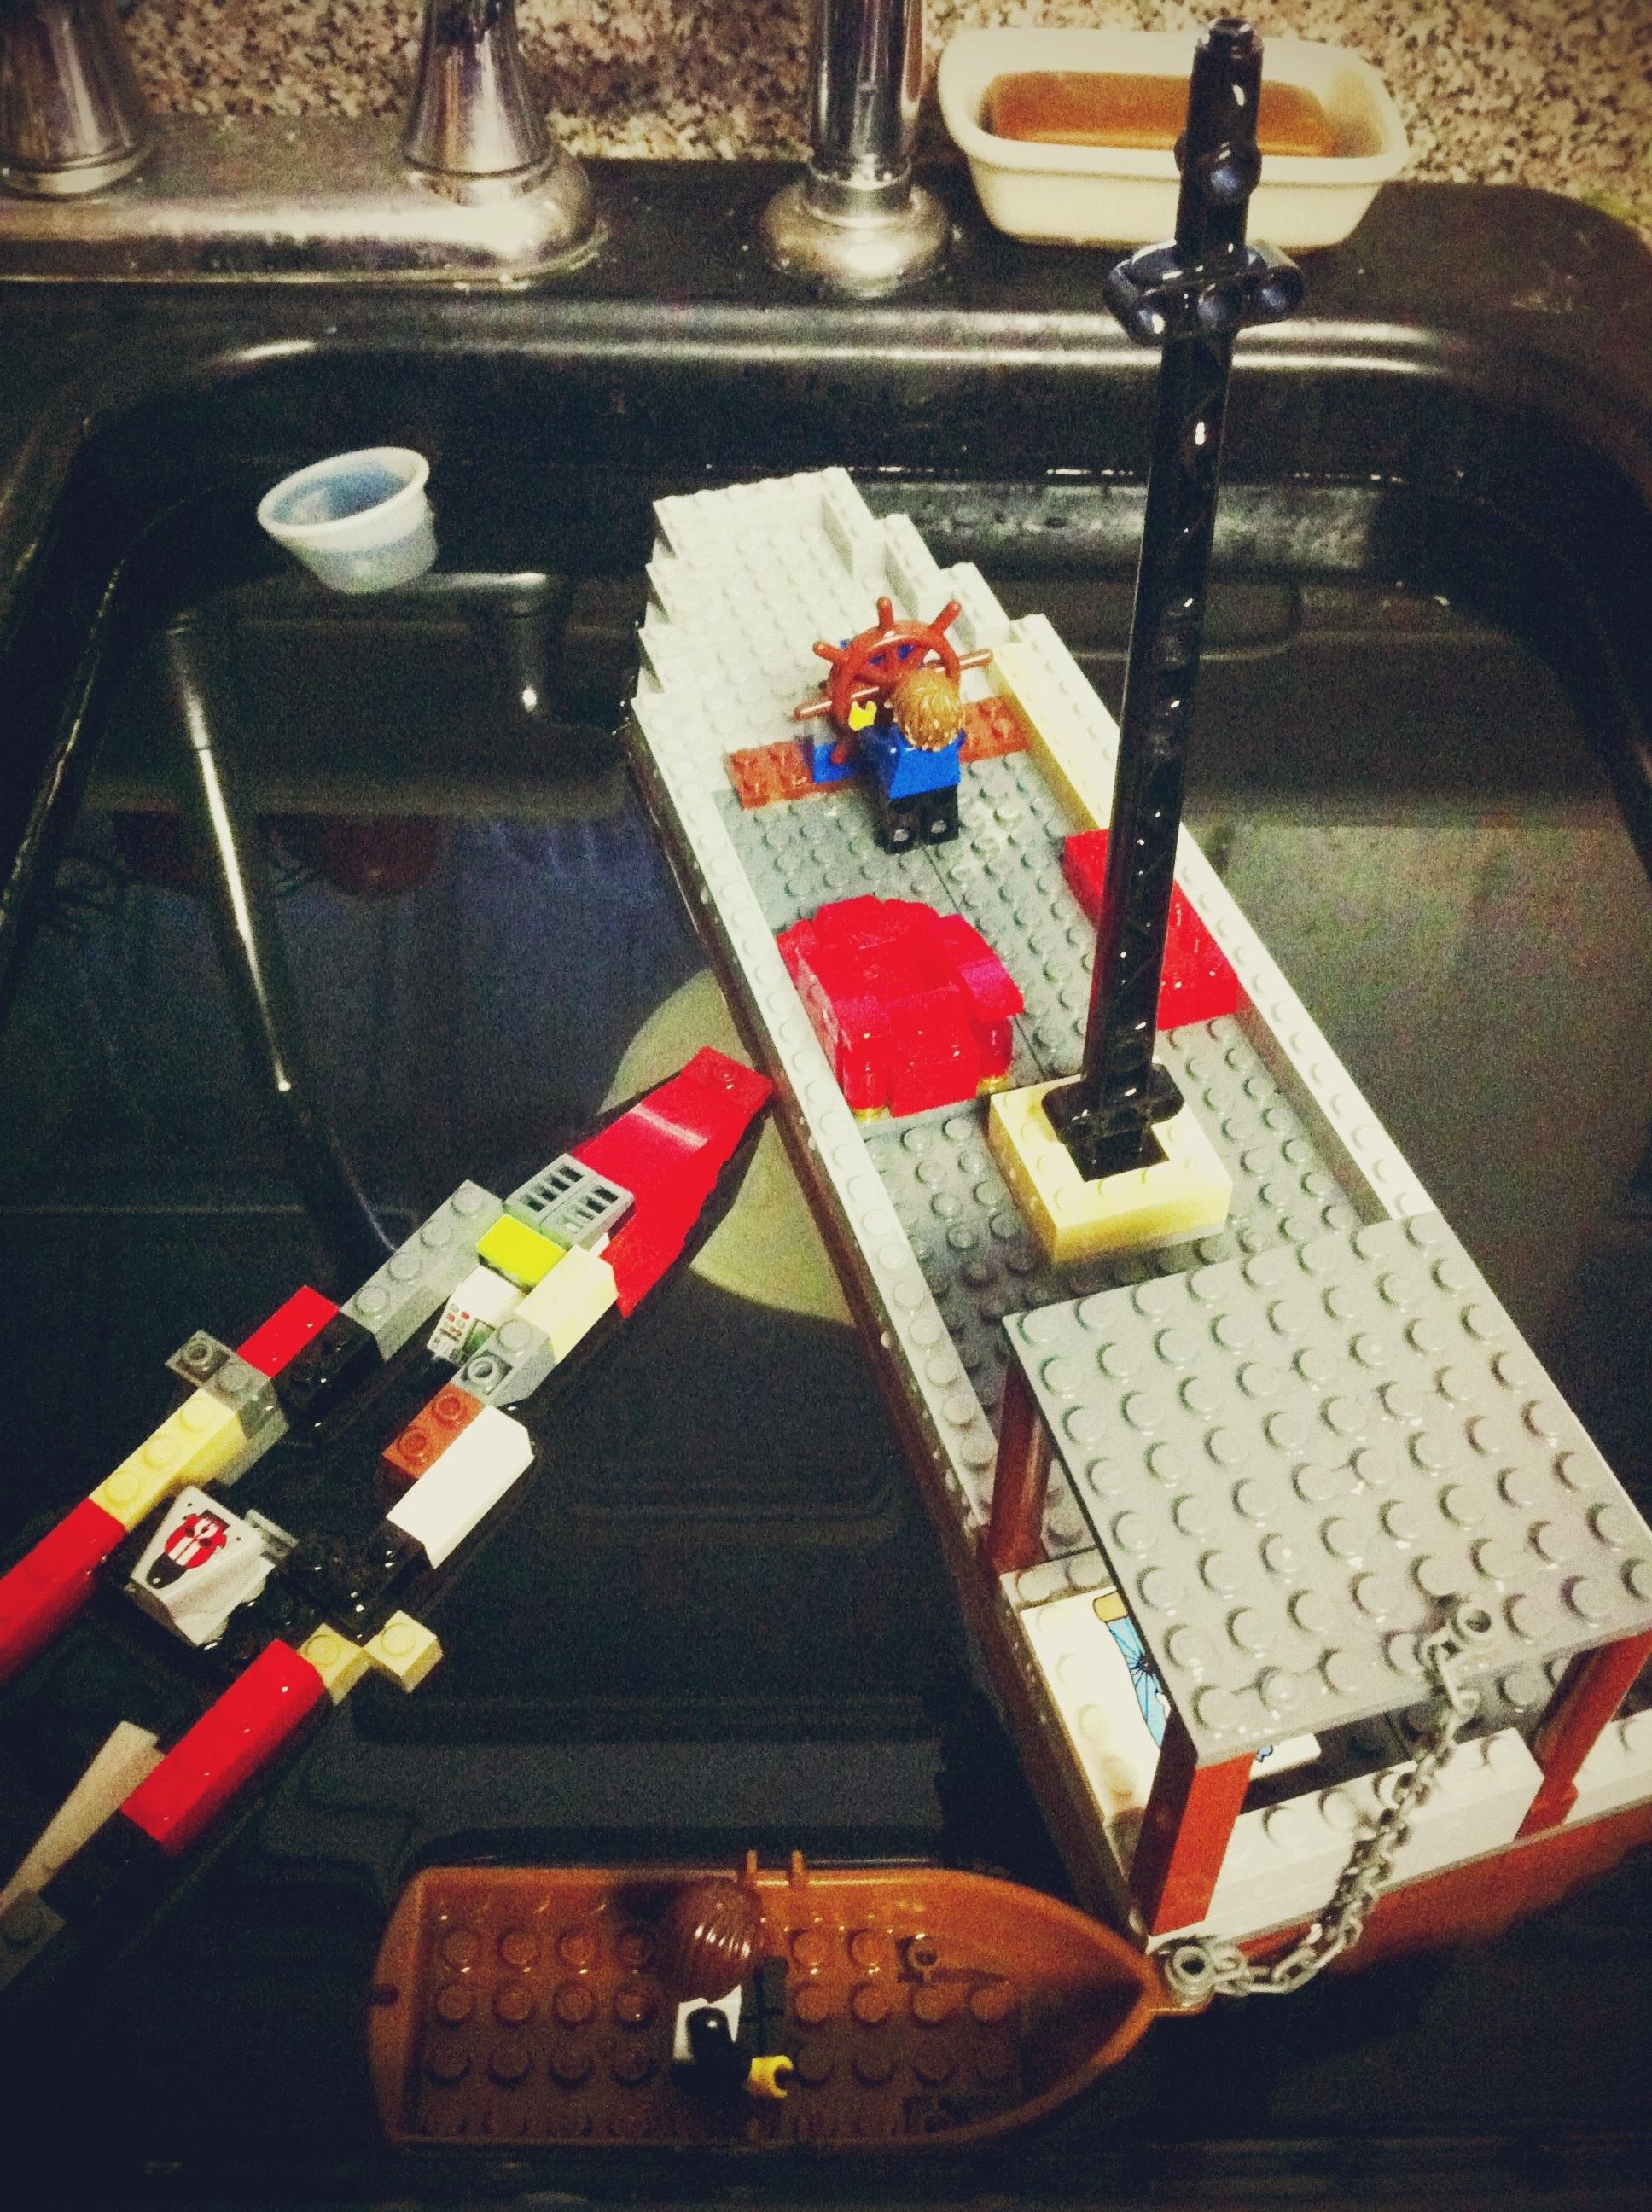 Lego ships in the kitchen sink.JPG